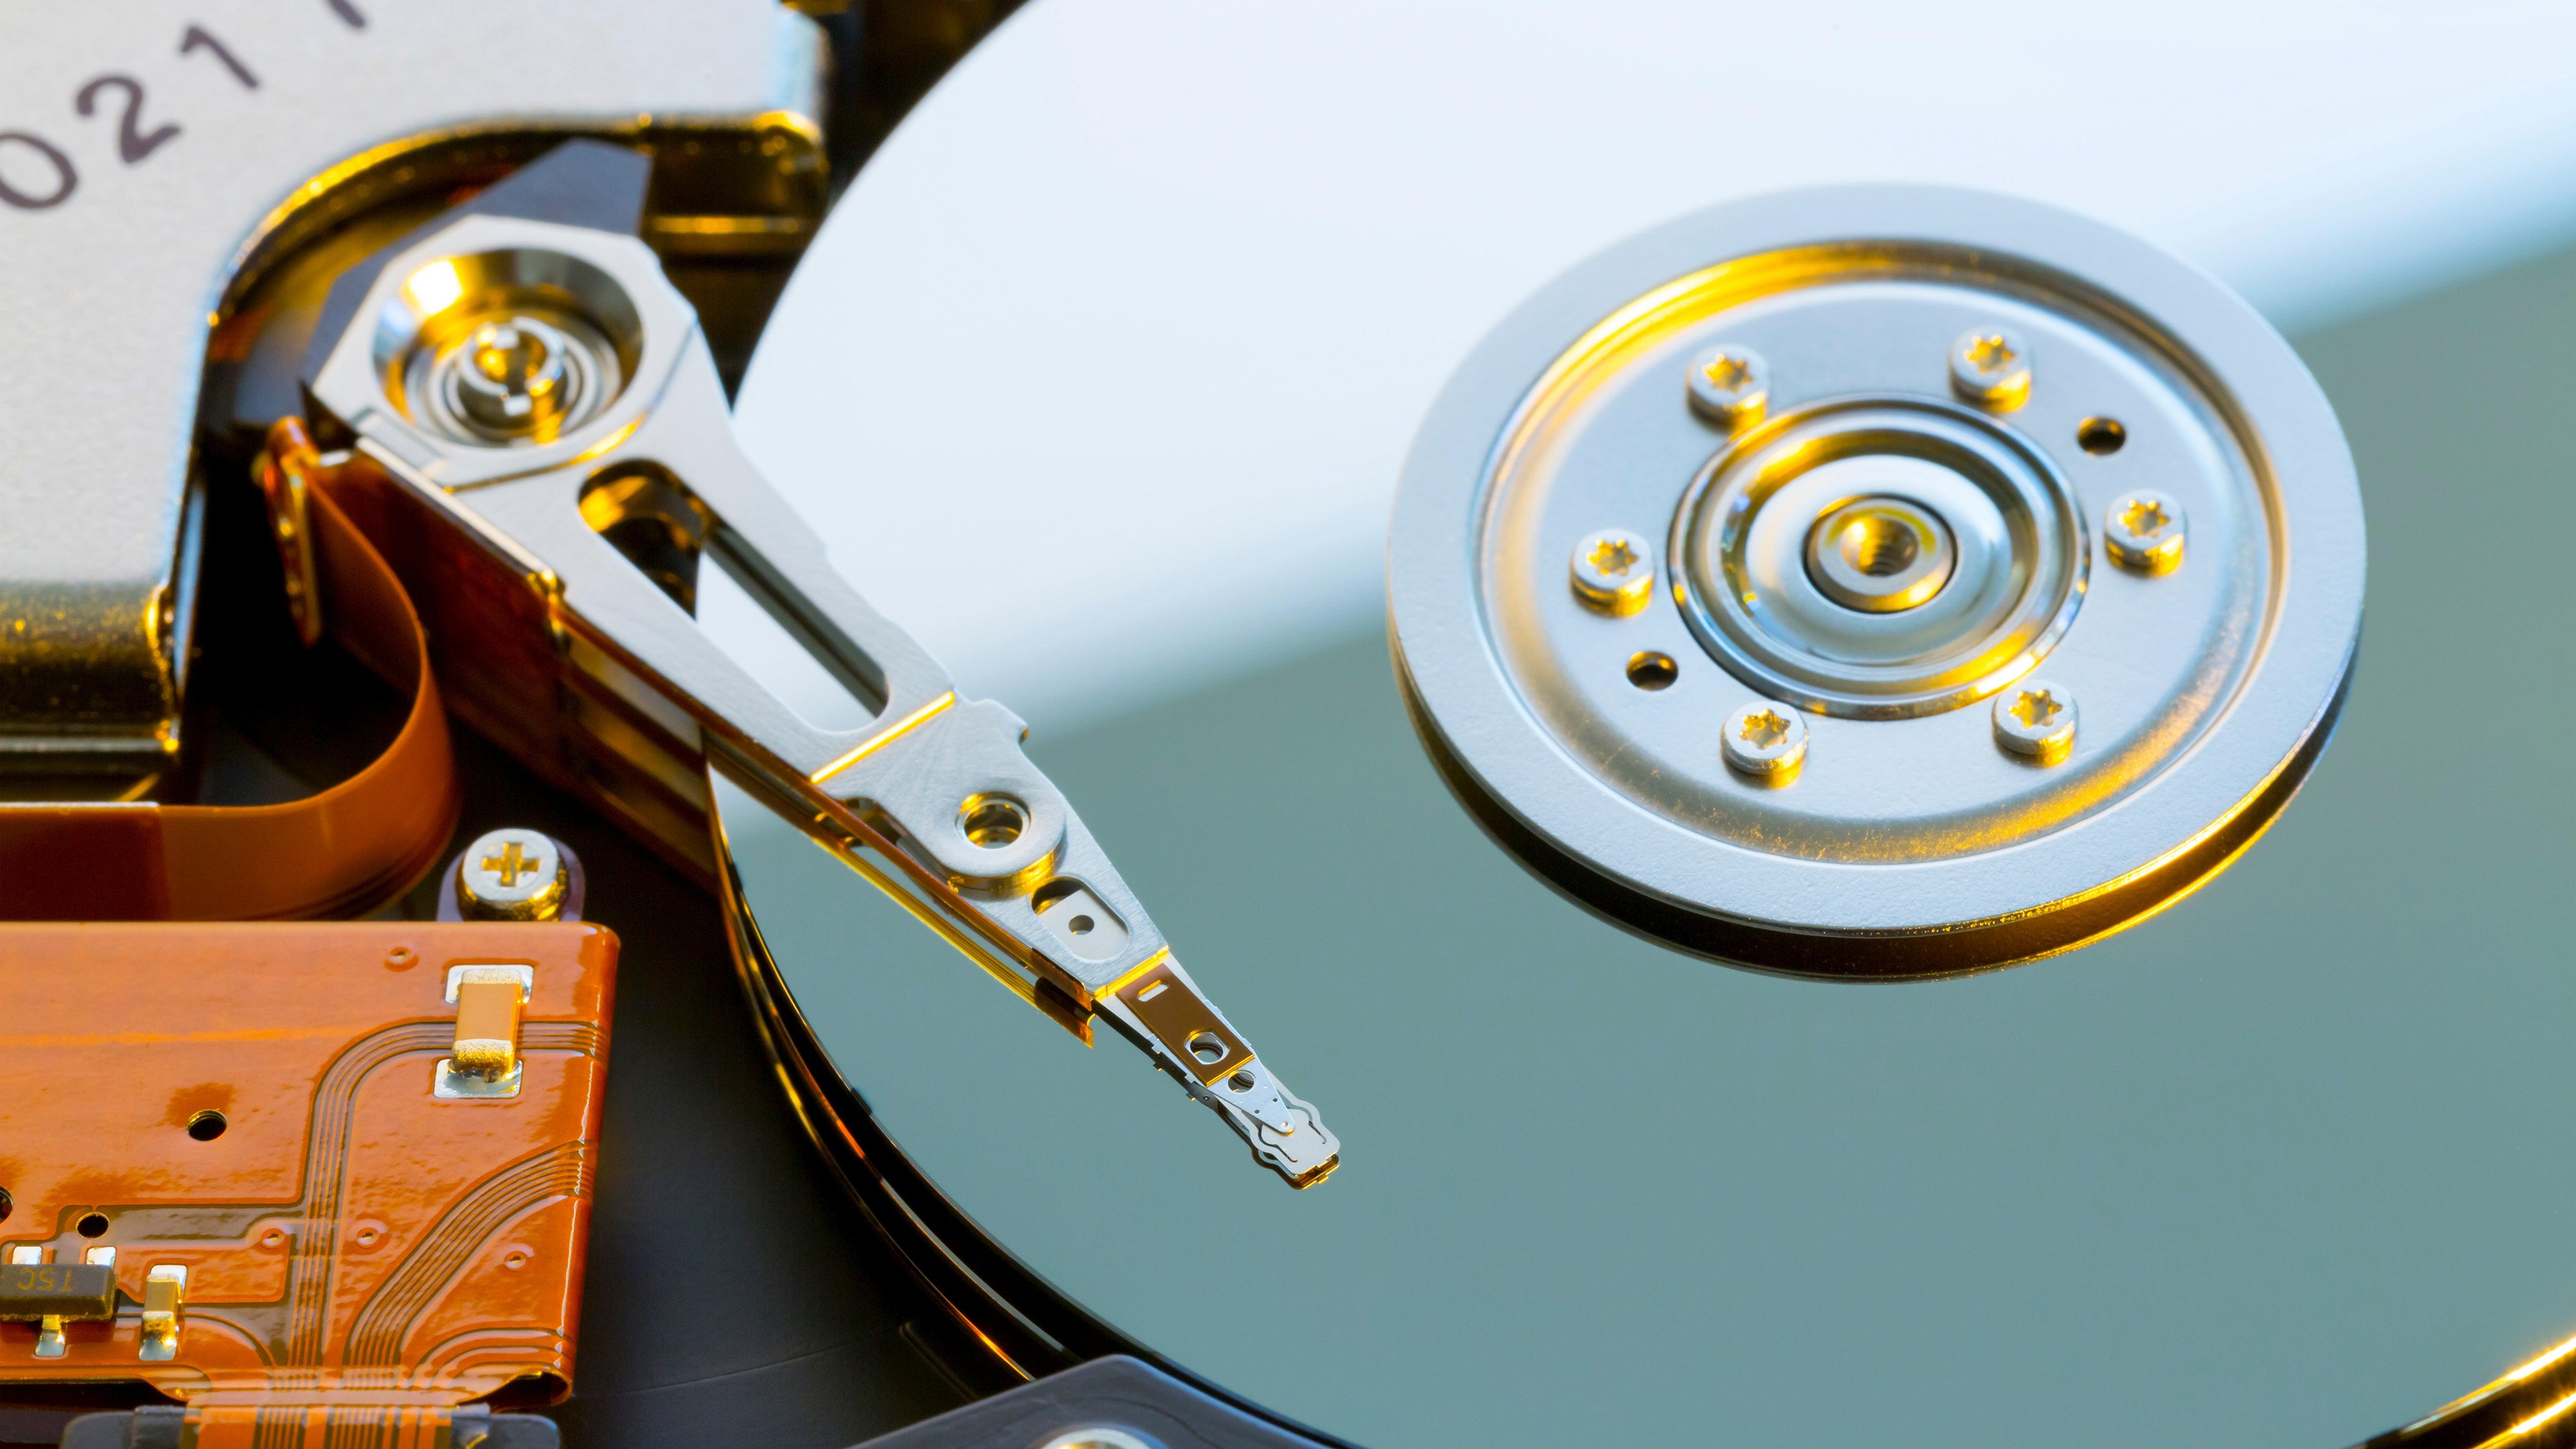 au file-storage storage xpost